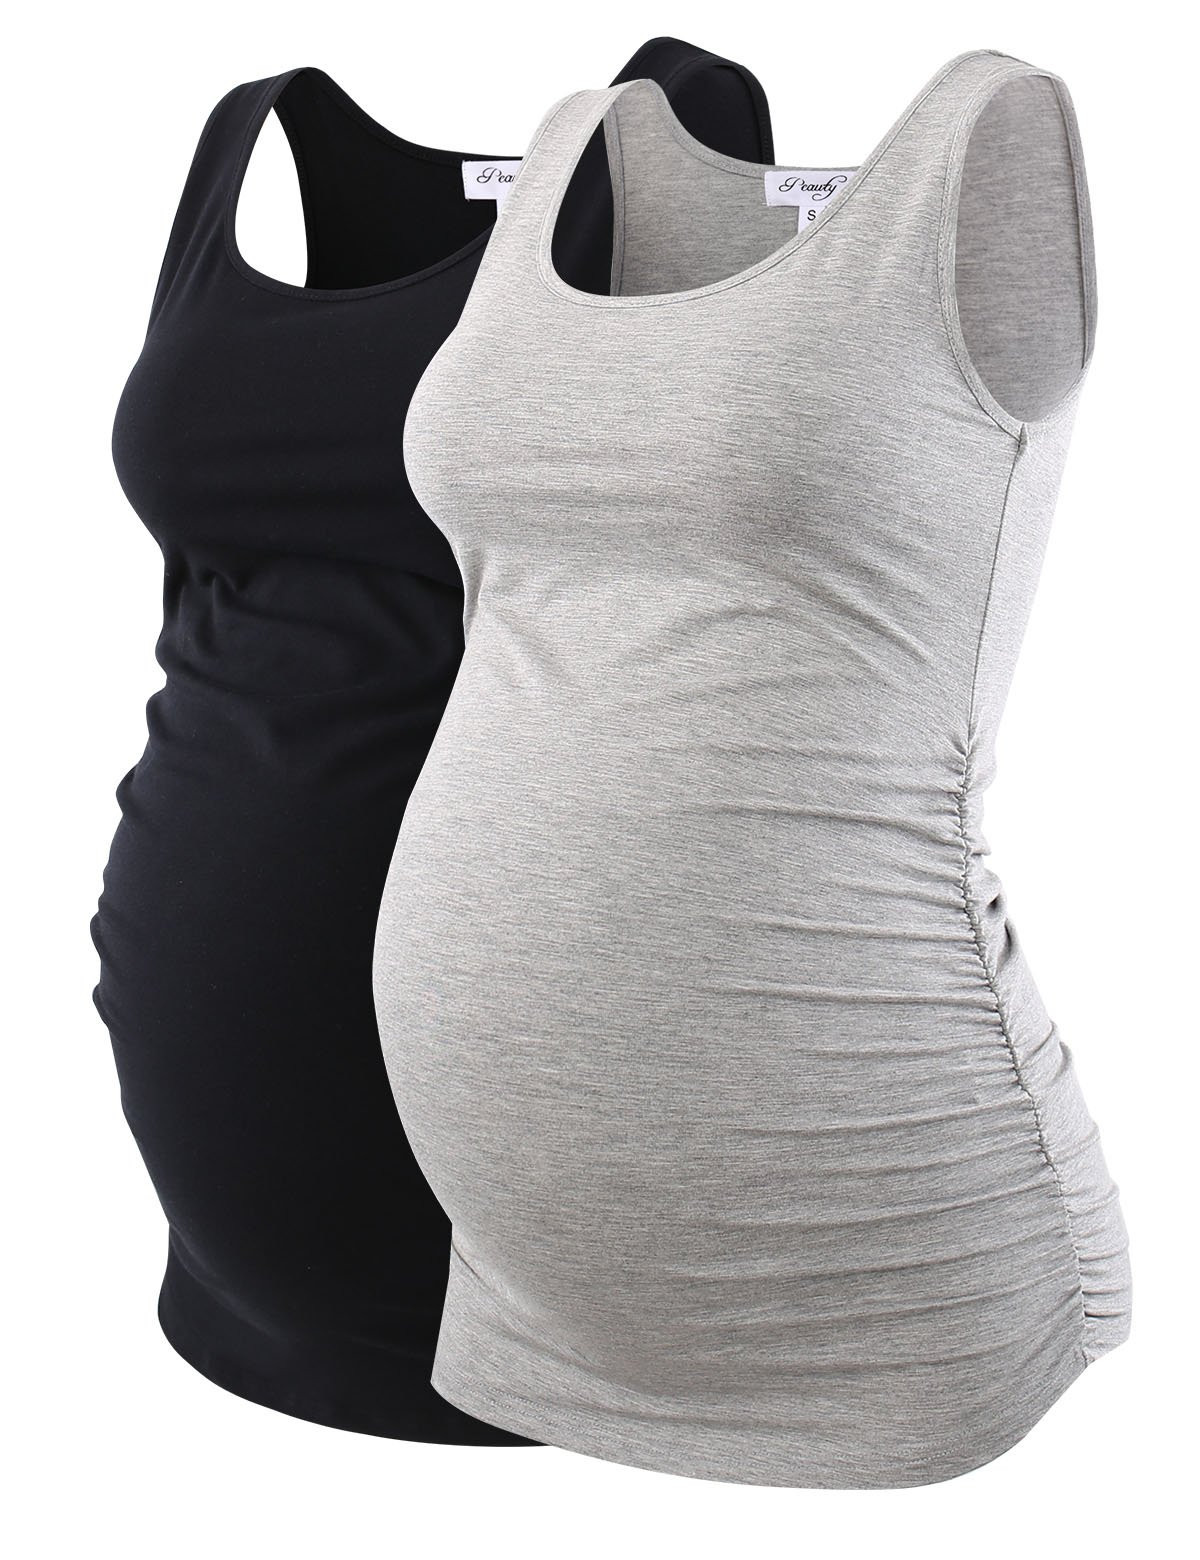 Peauty Maternity Tank Tops Bathing Suit t Shirts Shorts Pregnancy Clothes Women Plus Size 2X 3X (Black+Gray,M)